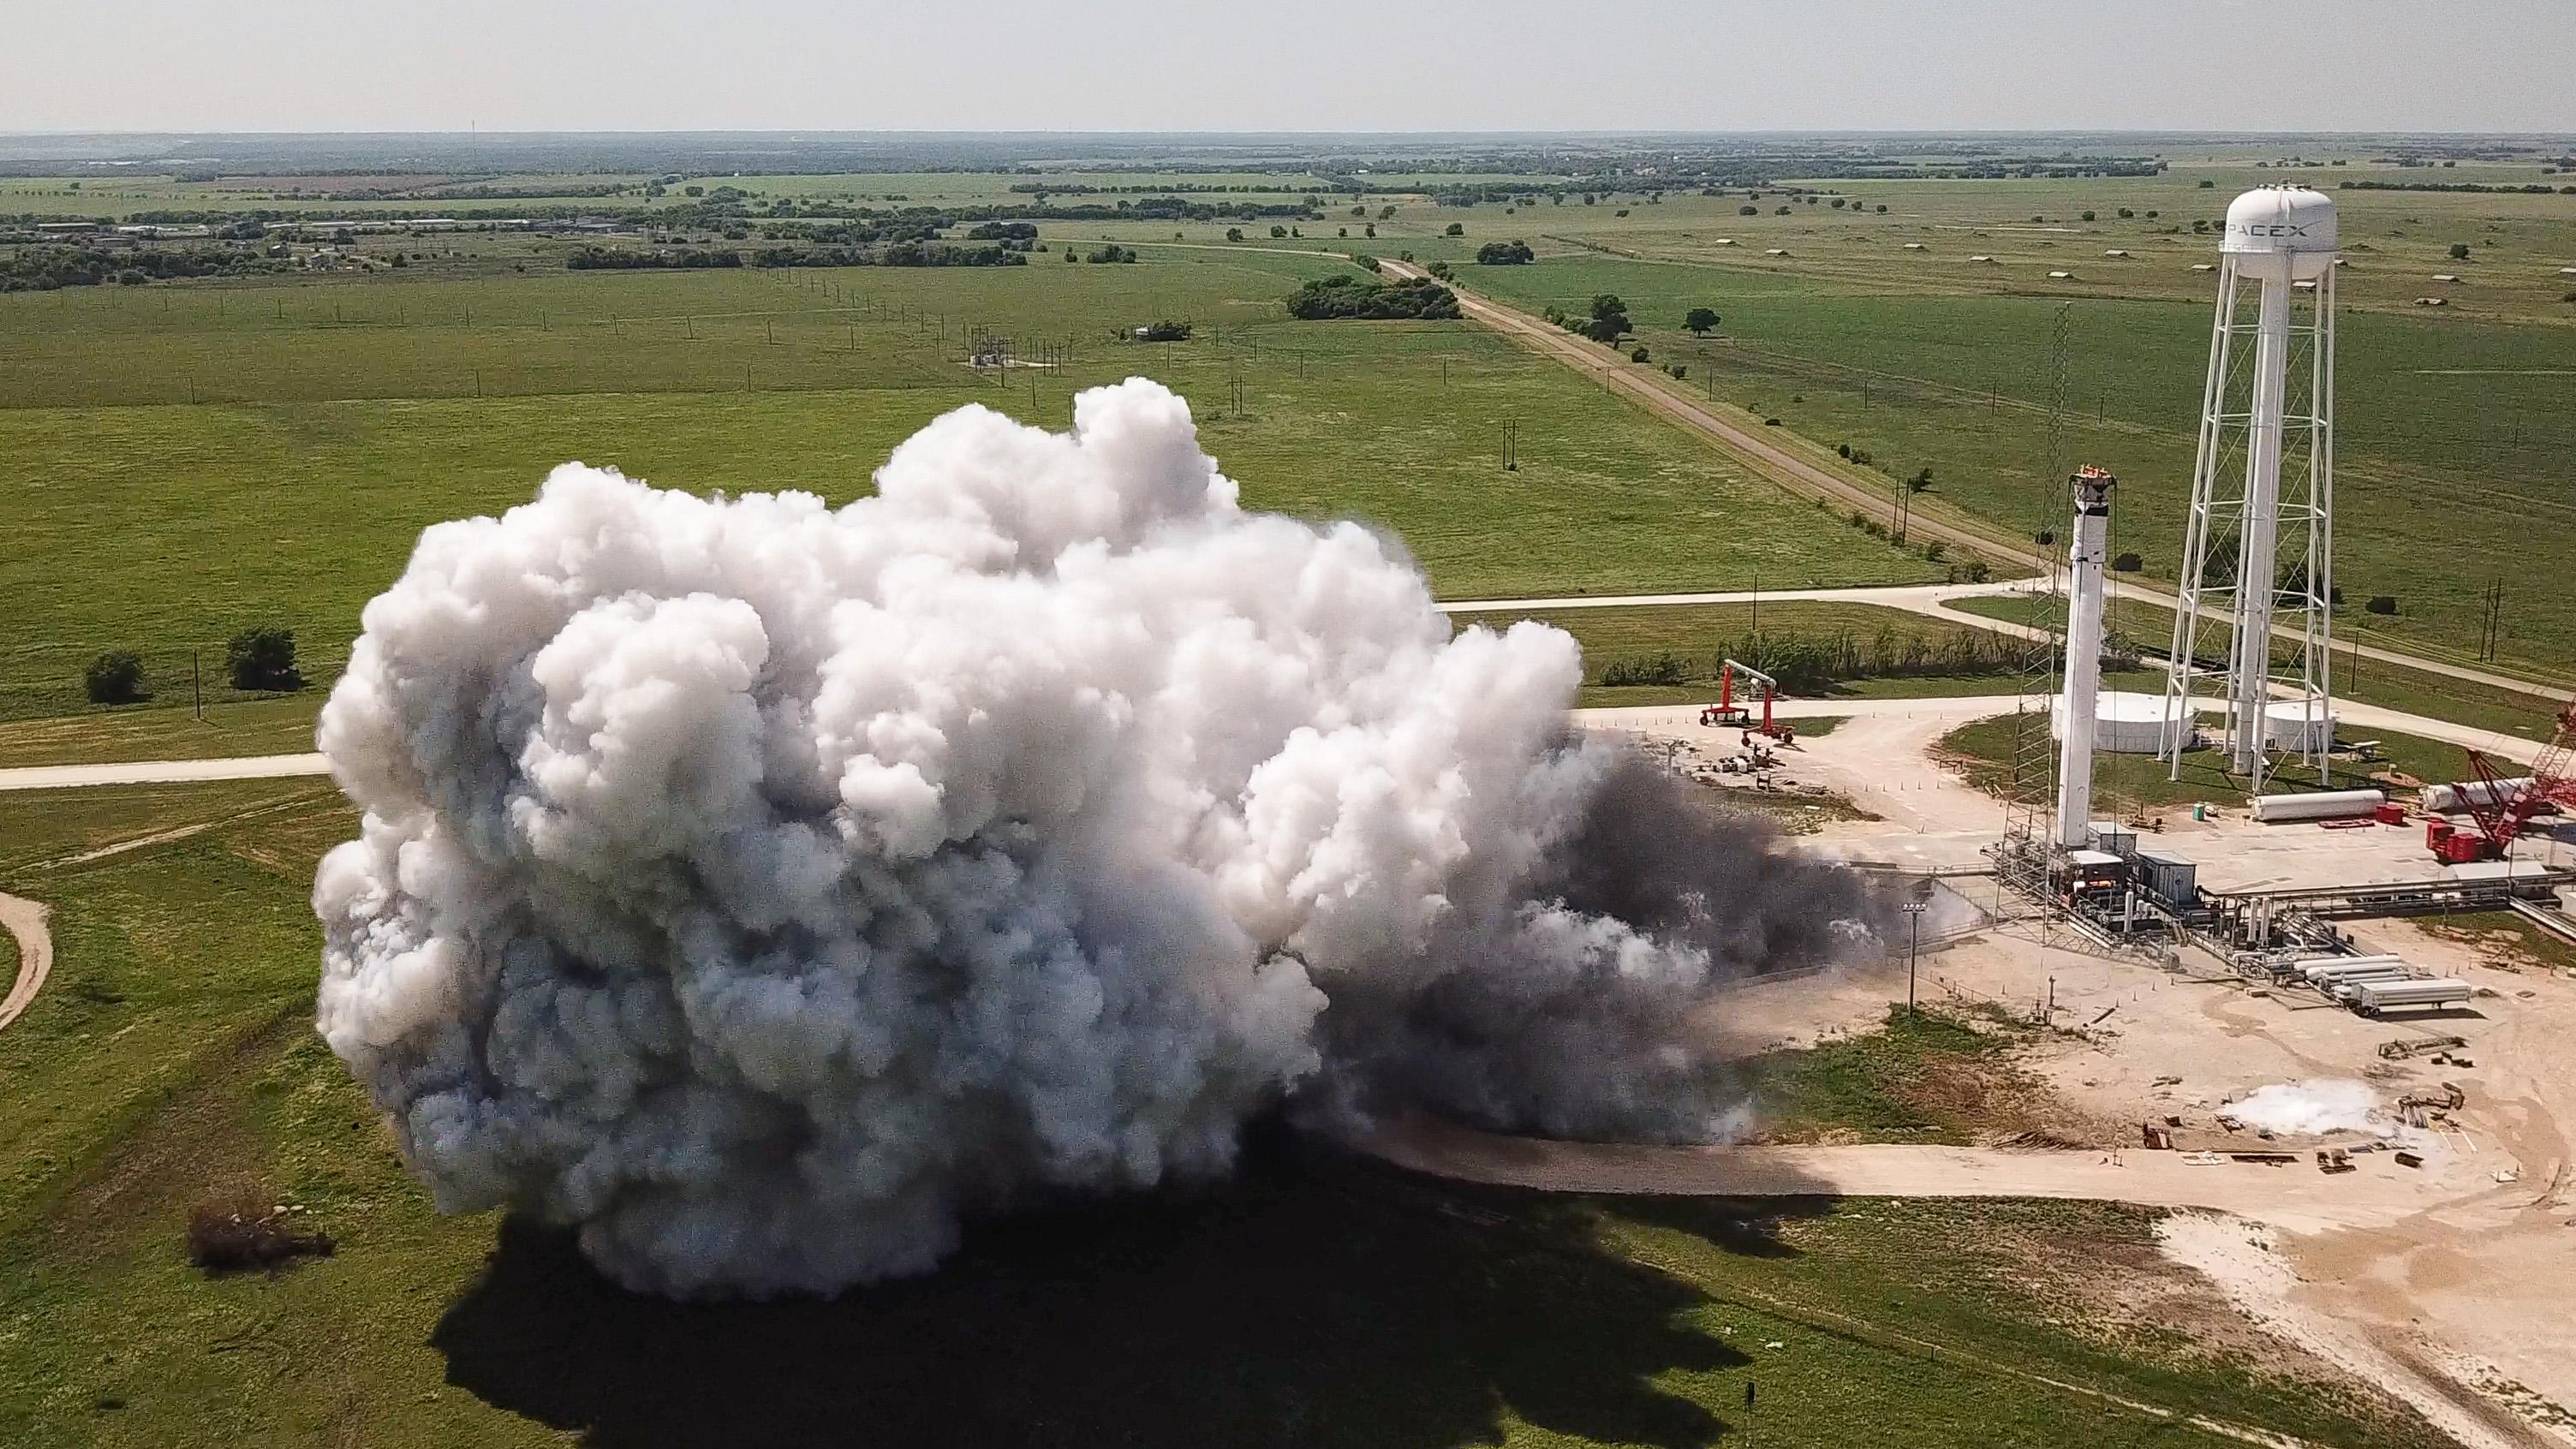 Falcon 9 (Crew Dragon USCV-1) - KSC - 31.10.2020 EWZ_w1BUcAAZAl4?format=jpg&name=4096x4096